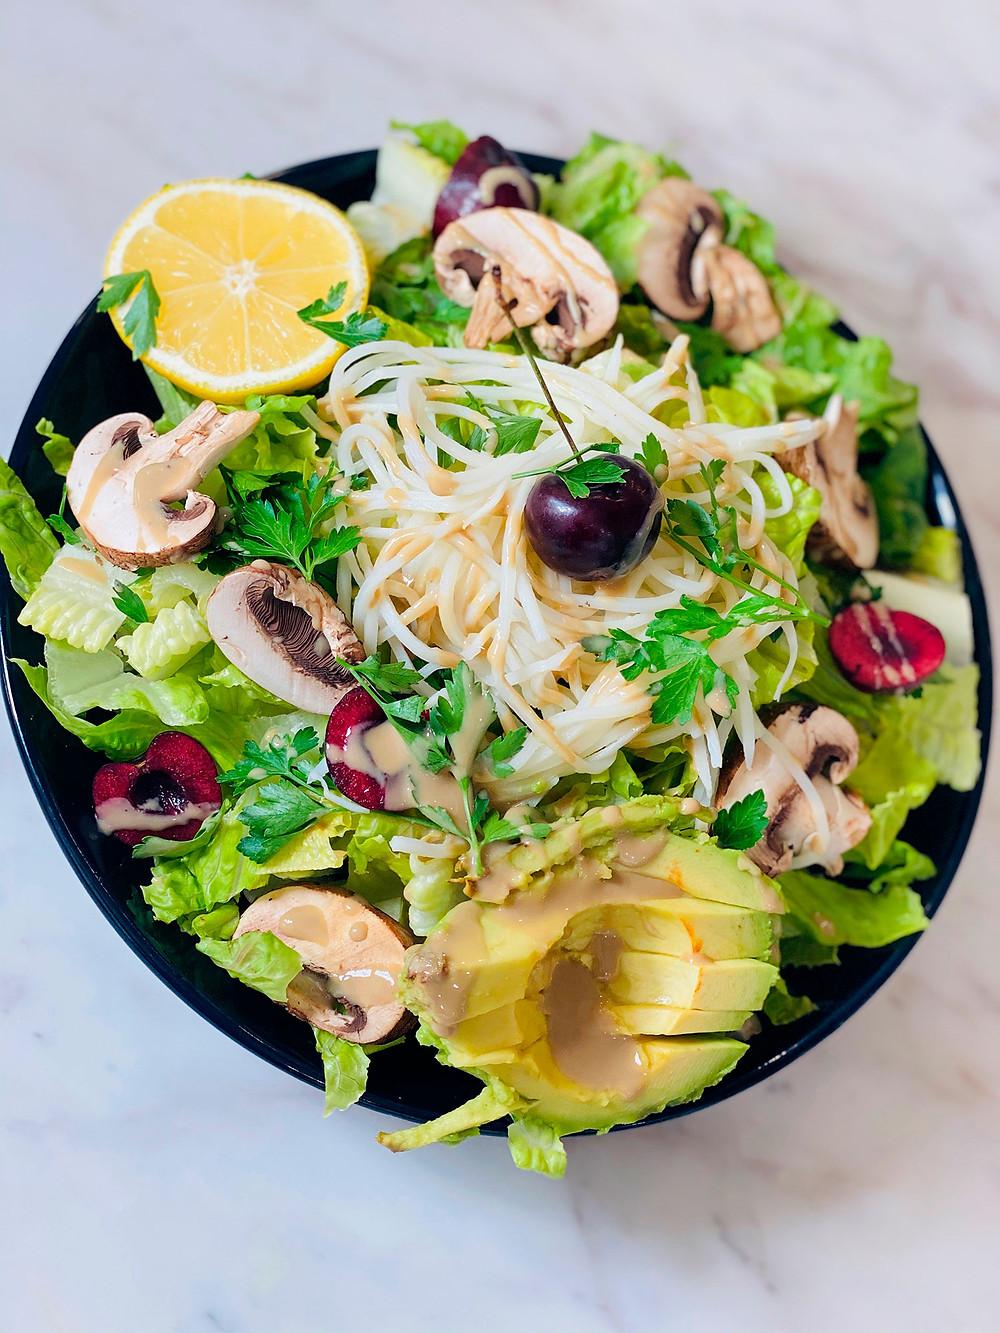 ketogenic pasta recipe vegan vegetarian healthy life selections website  by Marsha Merington